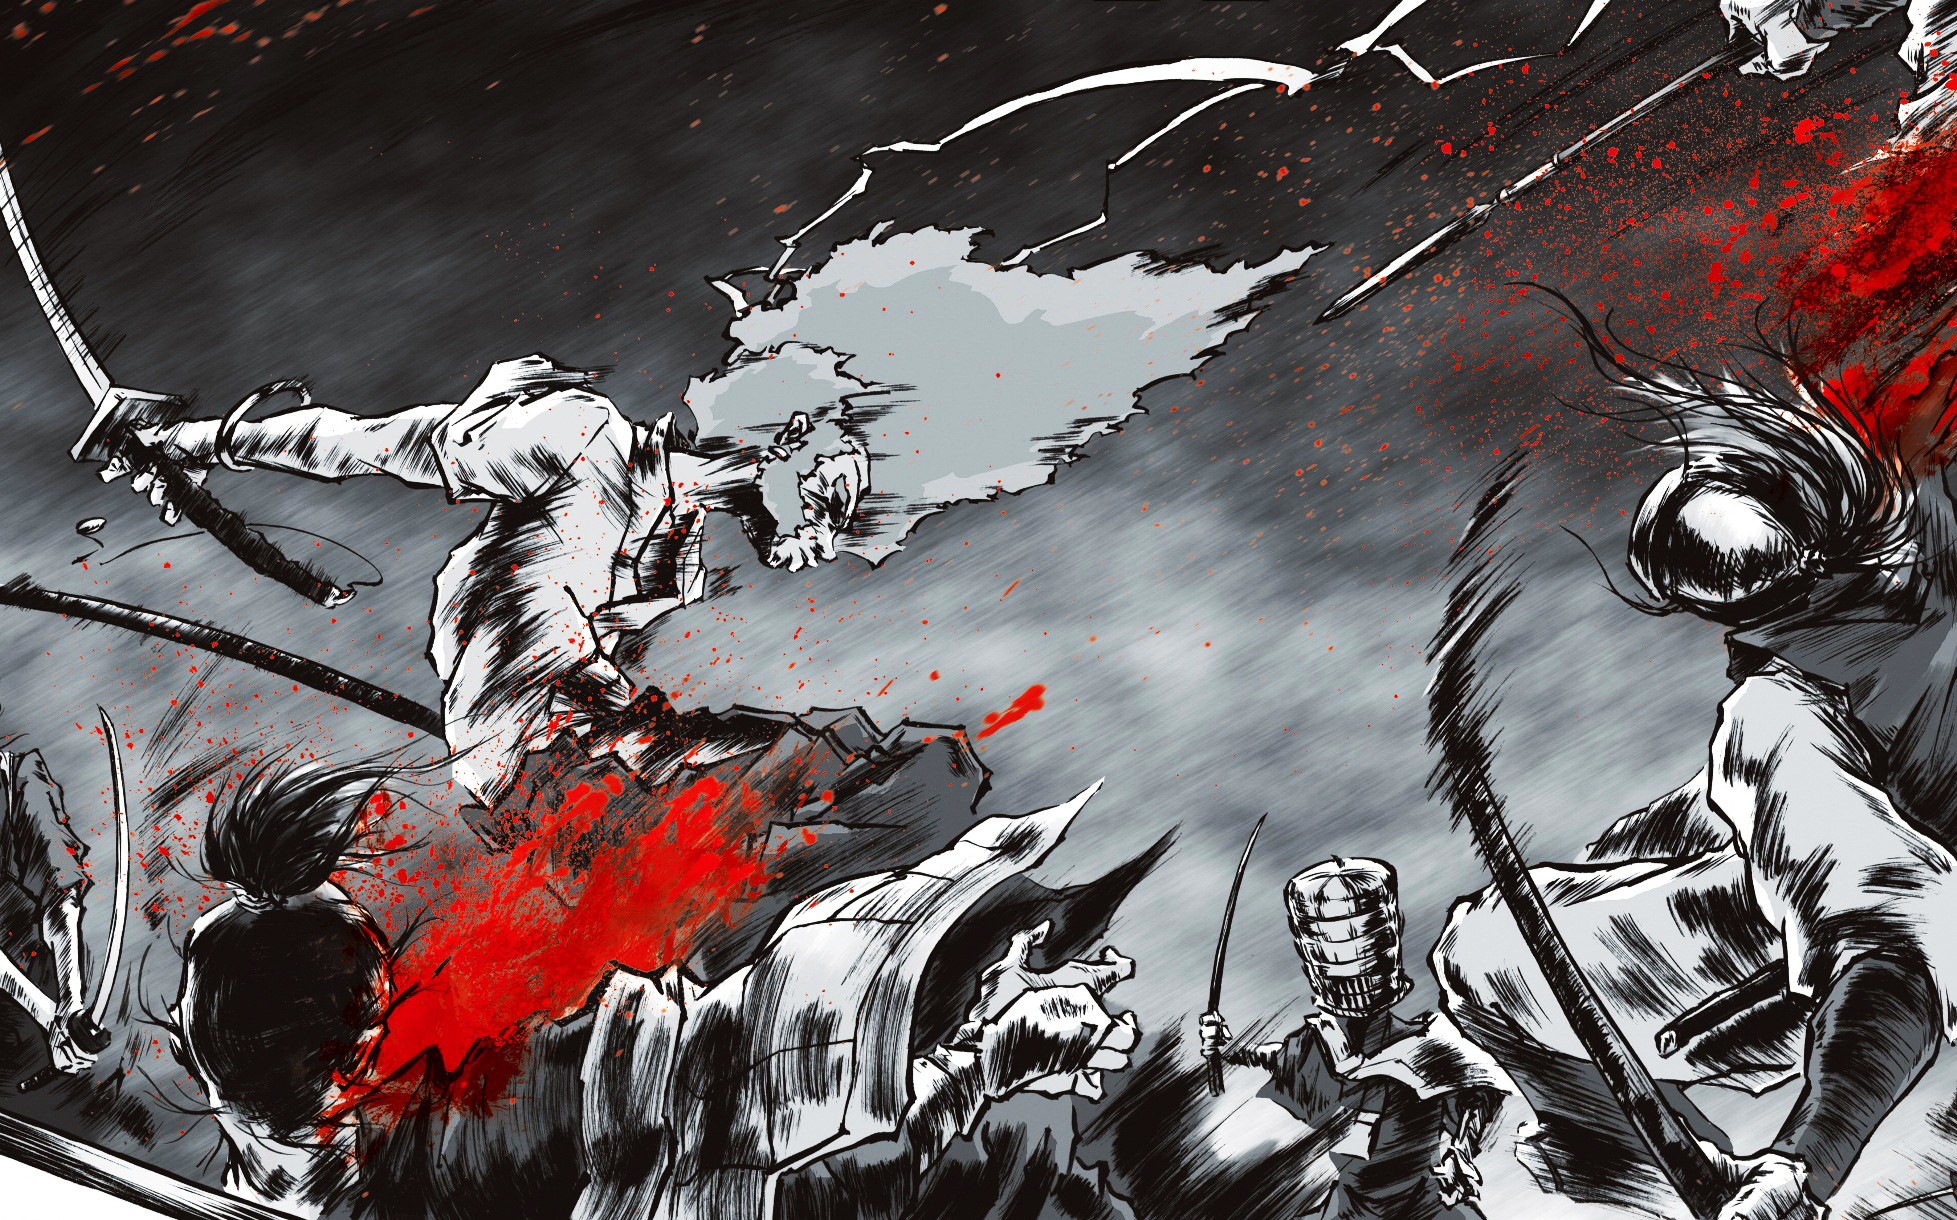 21++ 1080p Wallpaper Anime Samurai - Baka Wallpaper